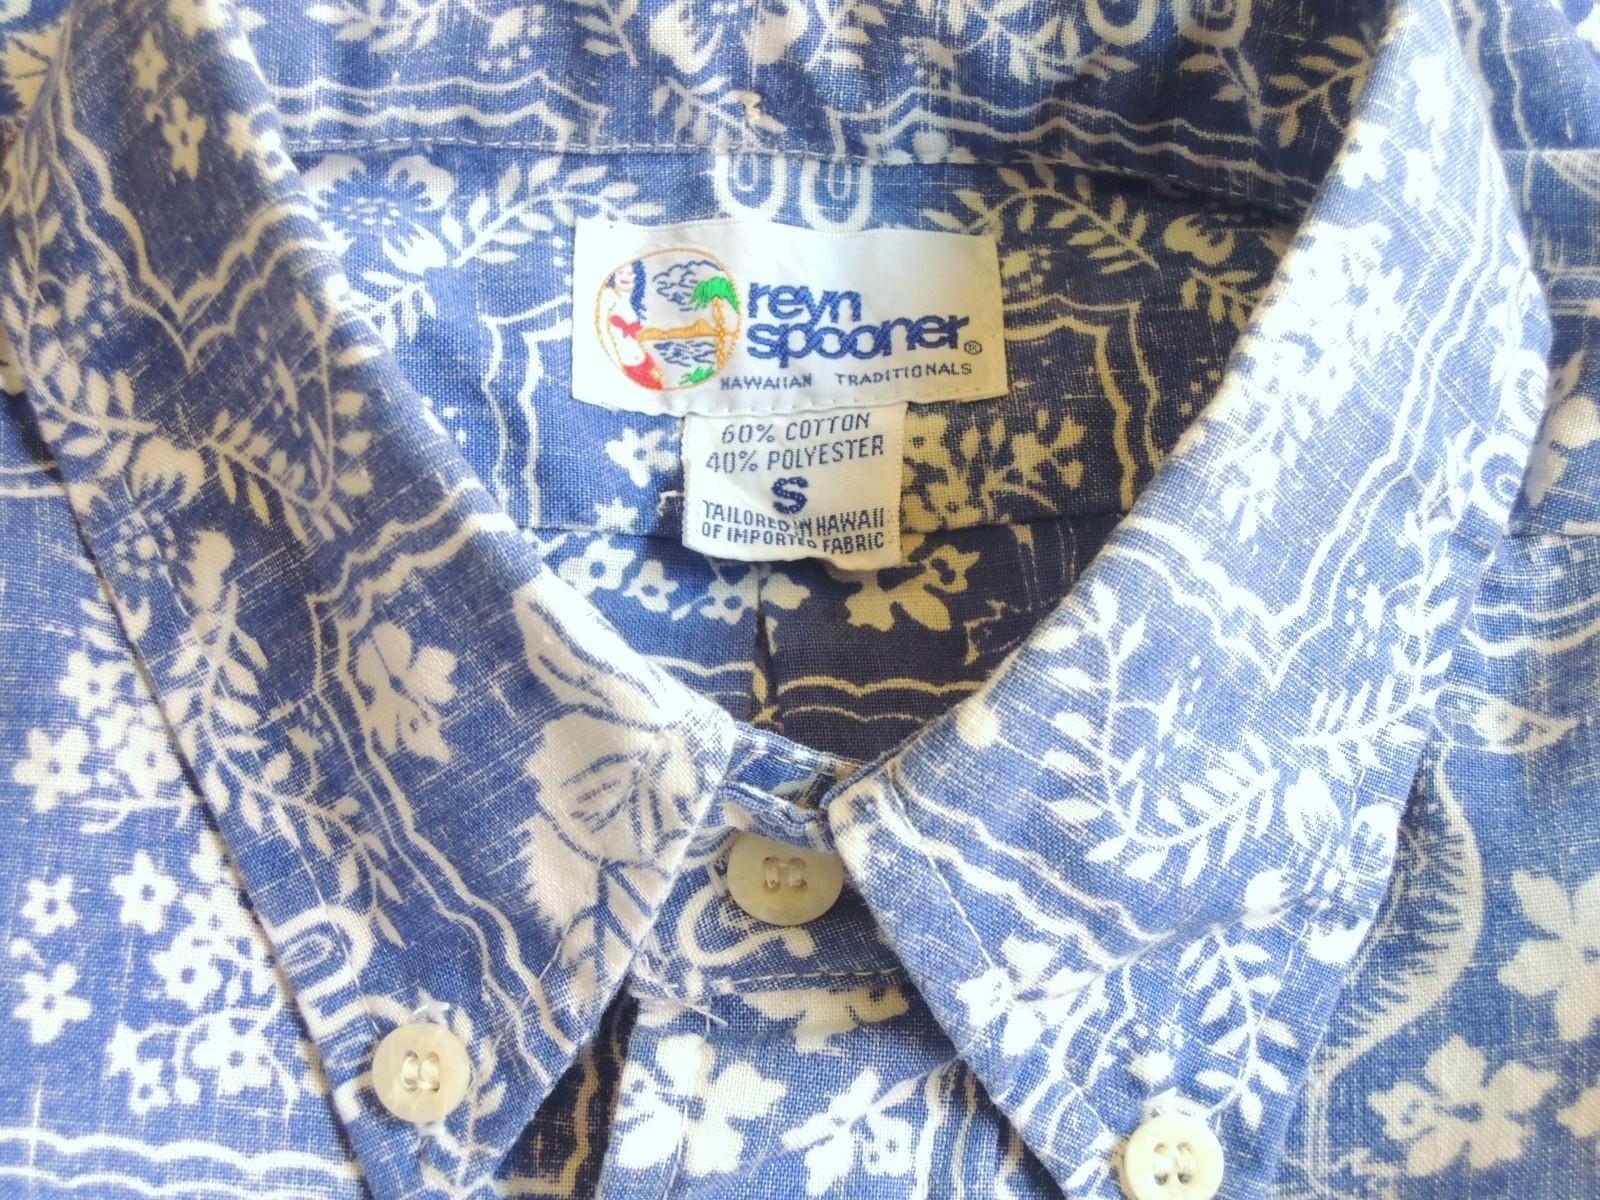 reynsponerpullovershirts03.JPG